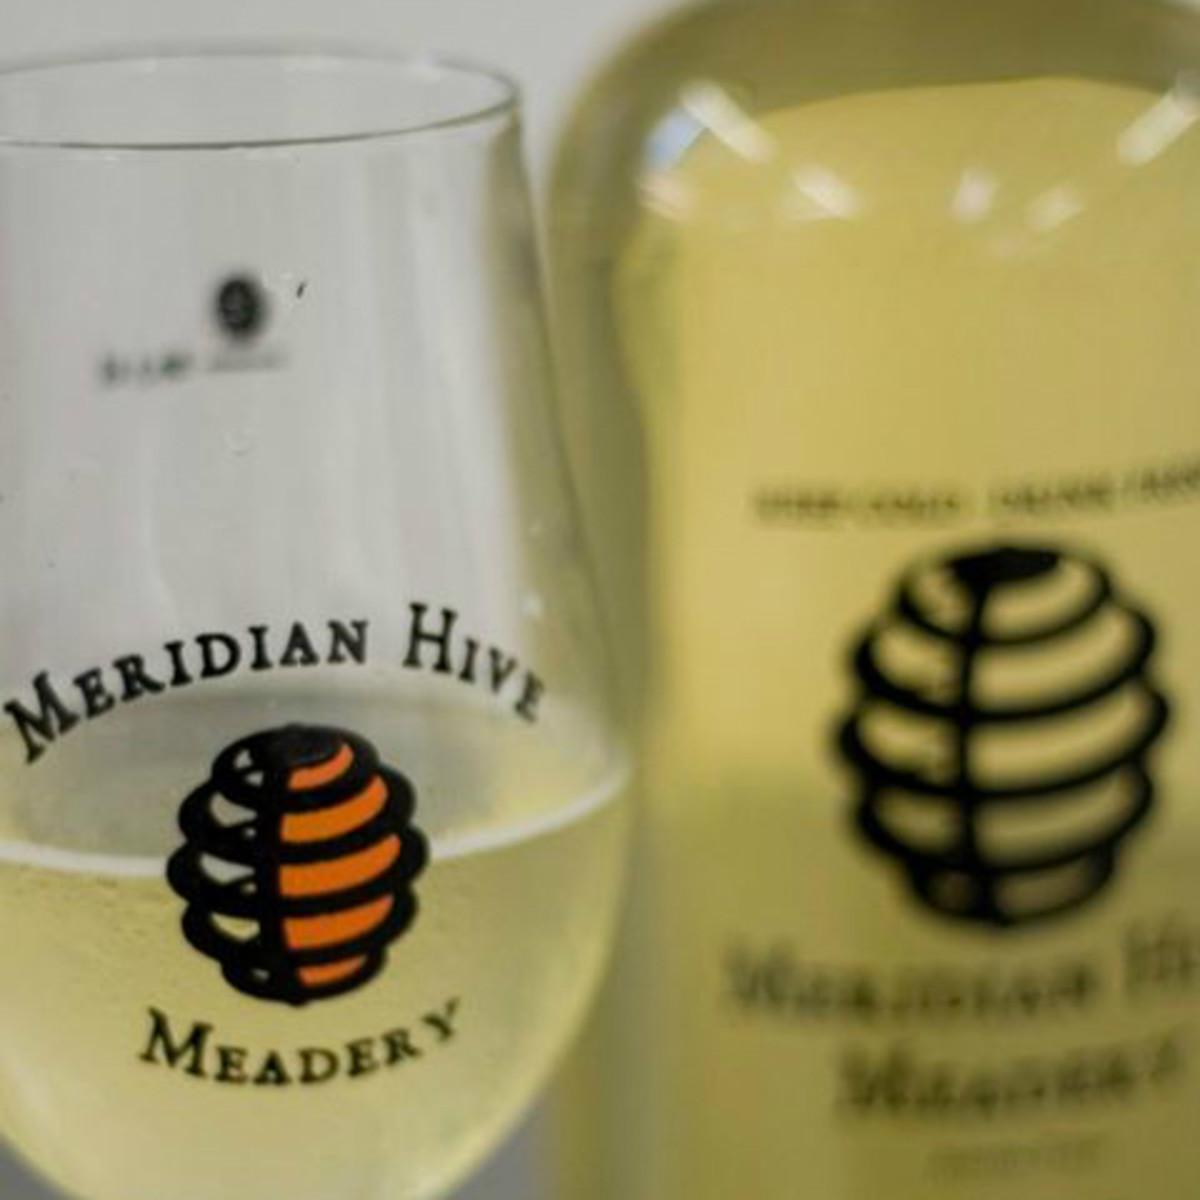 Meridian Hive Meadery_Austin_mead_2015